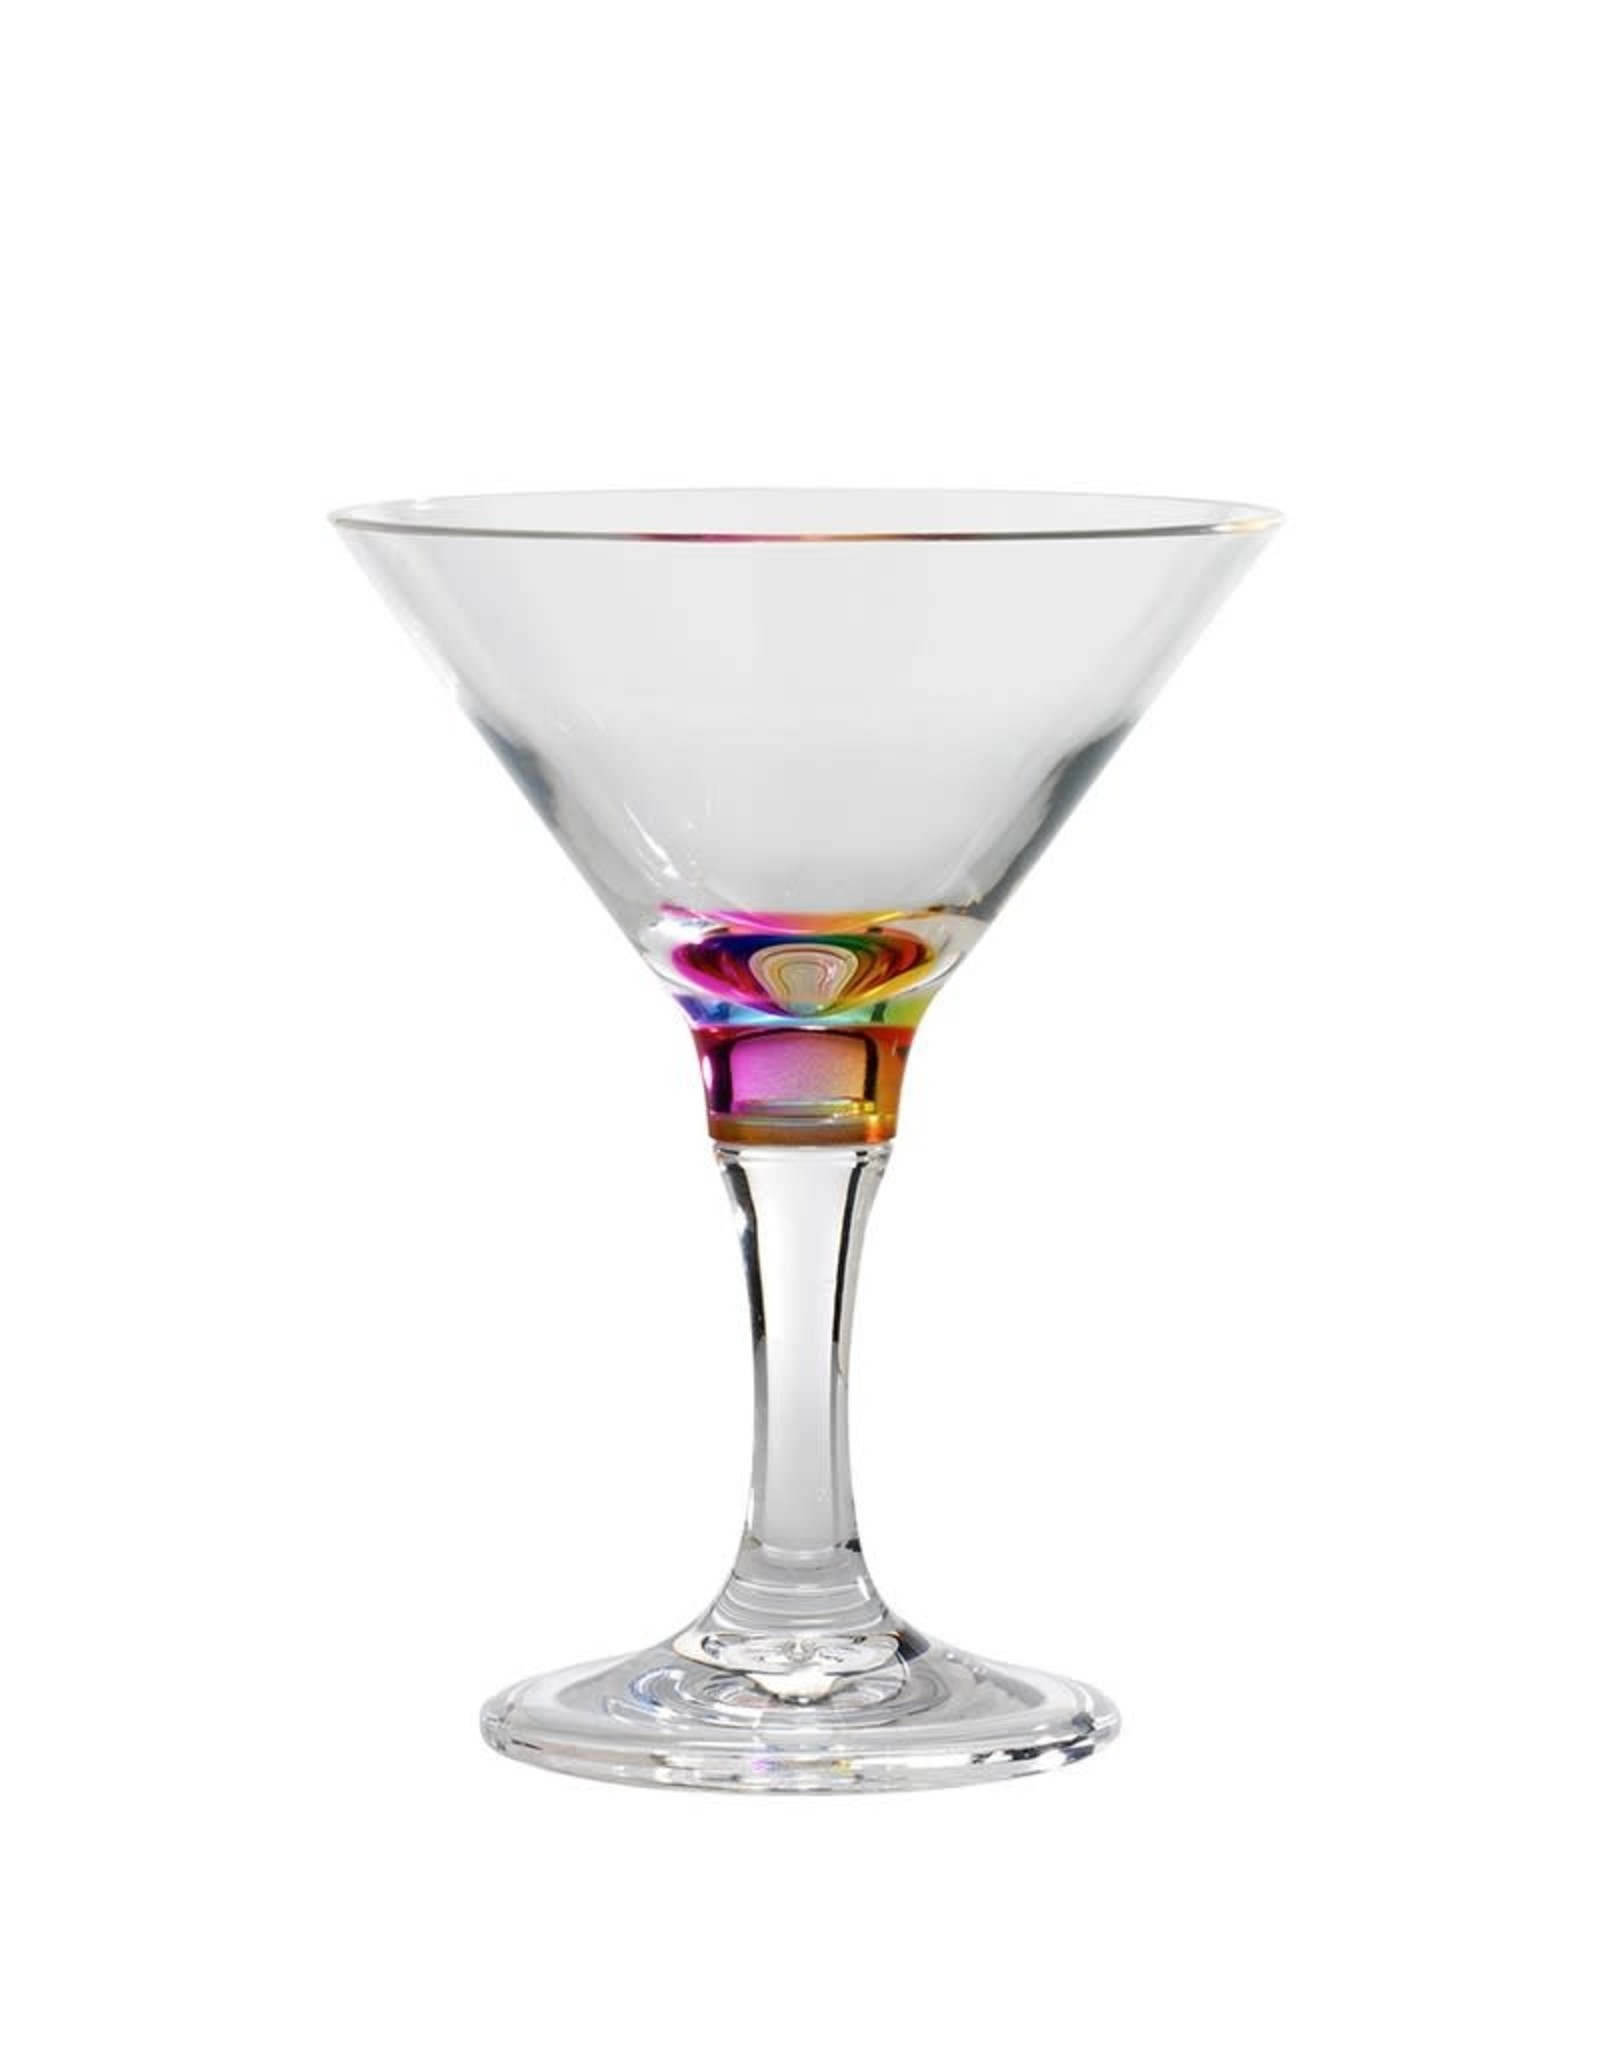 Merritt International Acrylic Crystal Rainbow Martini Glass 9oz